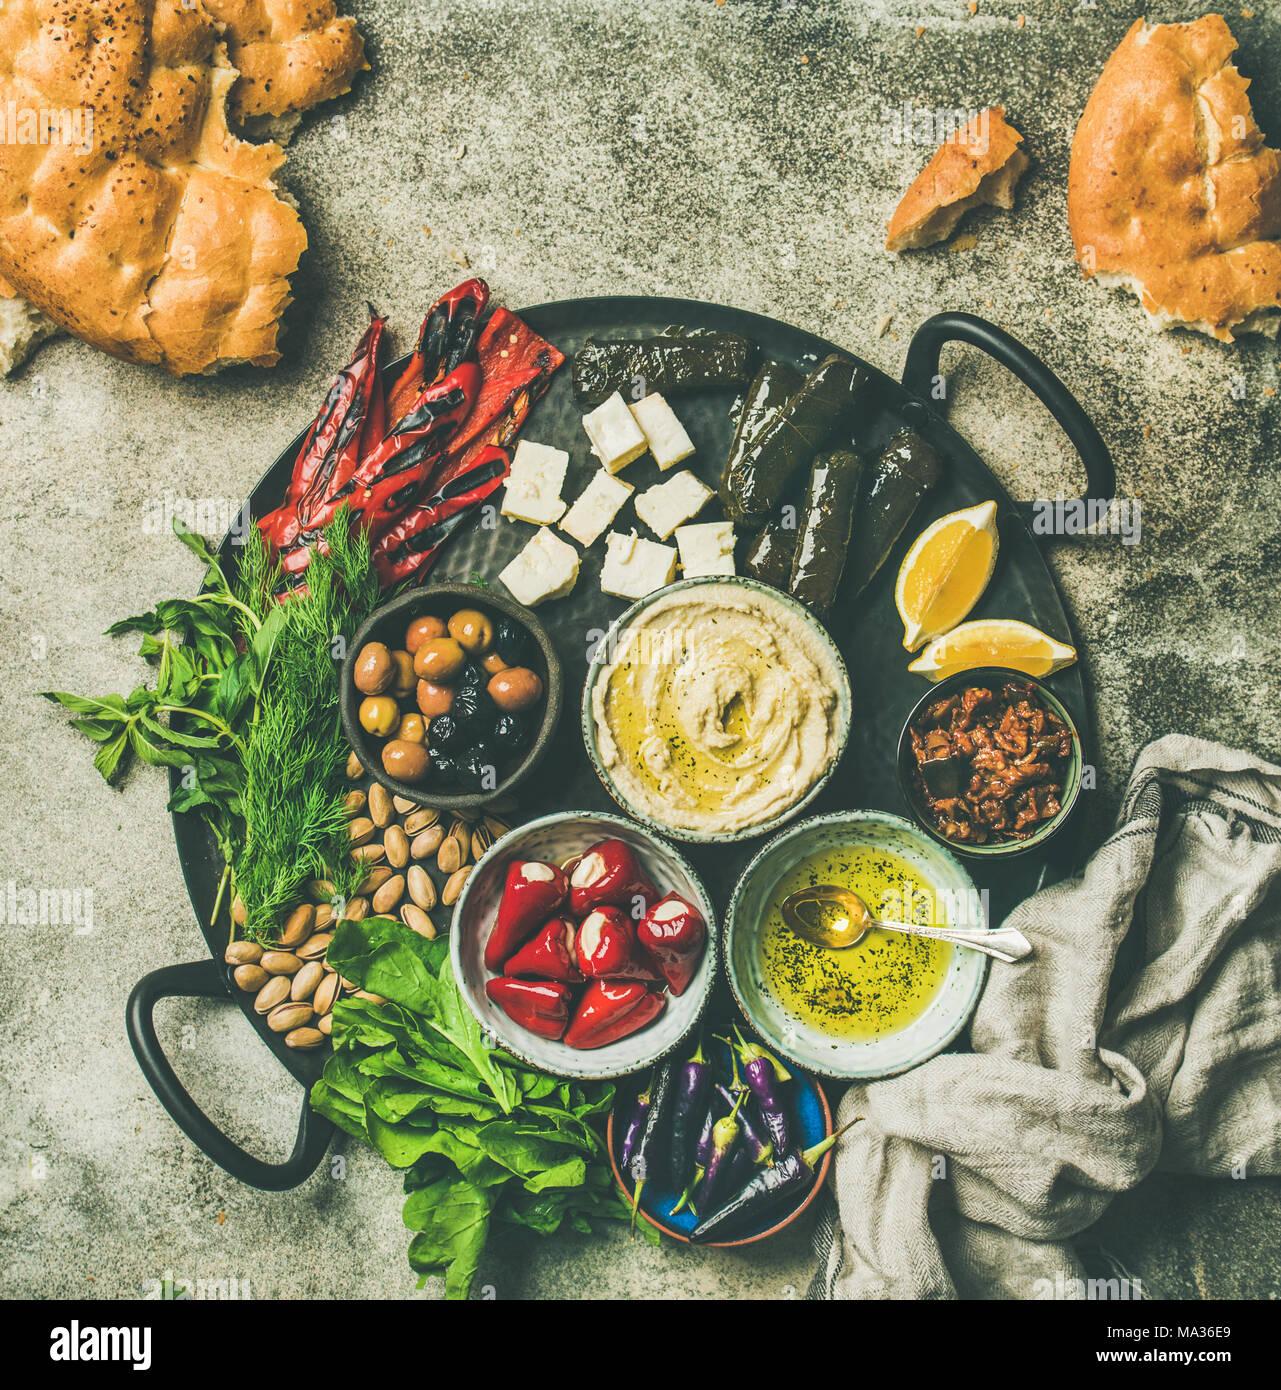 Mediterranean meze starter fingerfood platter, copy space - Stock Image